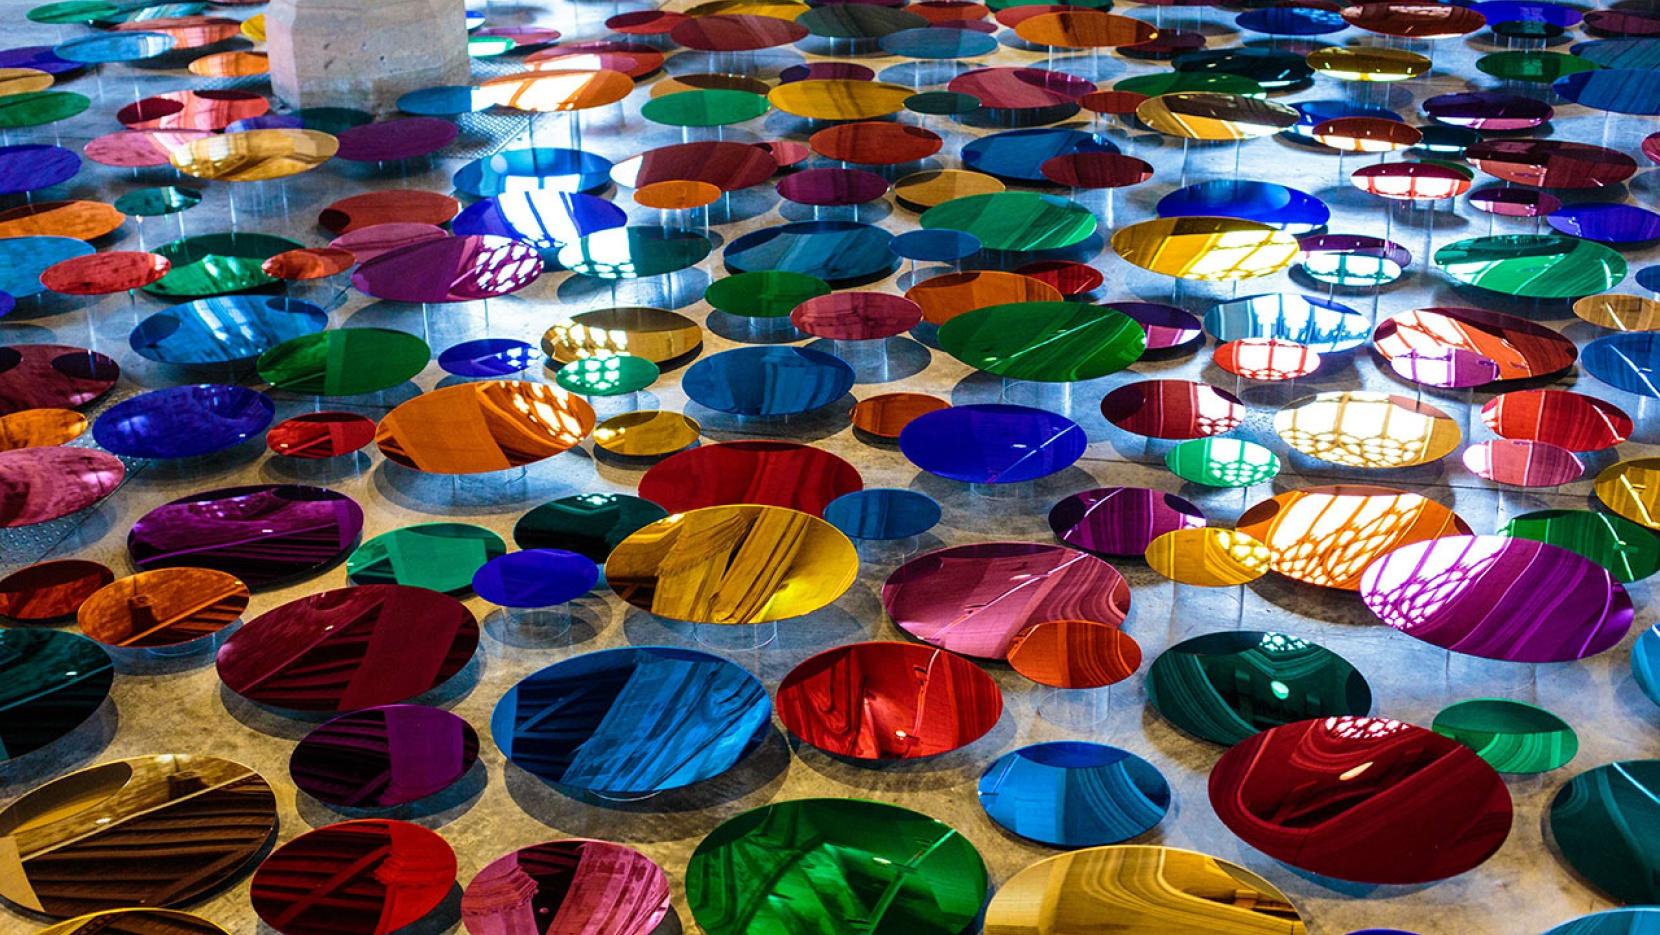 Our Colour Reflection Yatzeragenda